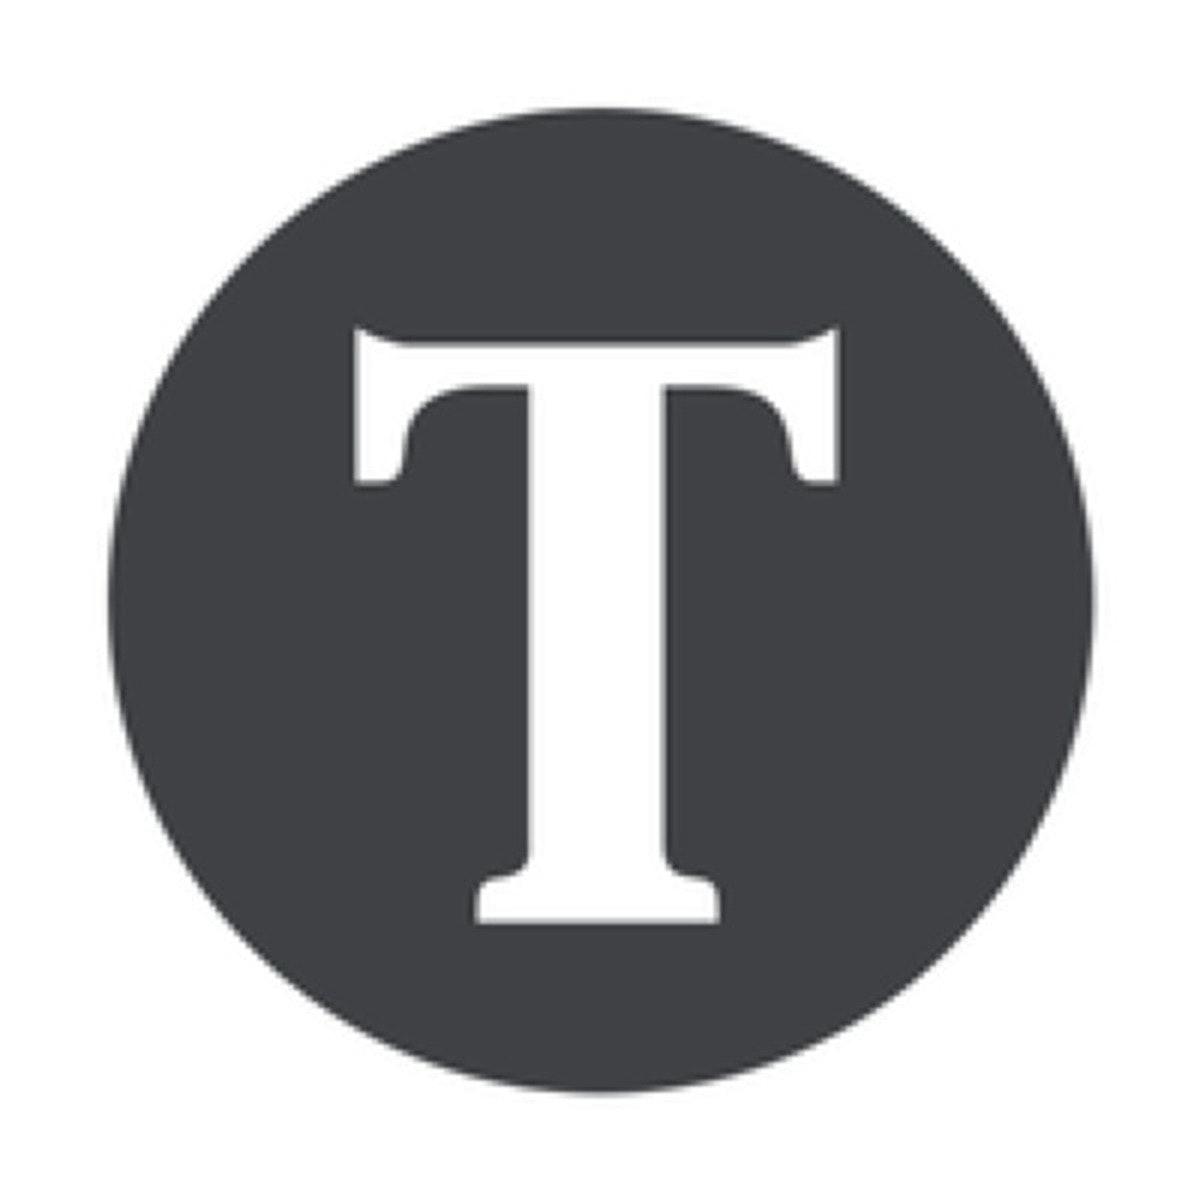 Tourlane GmbH